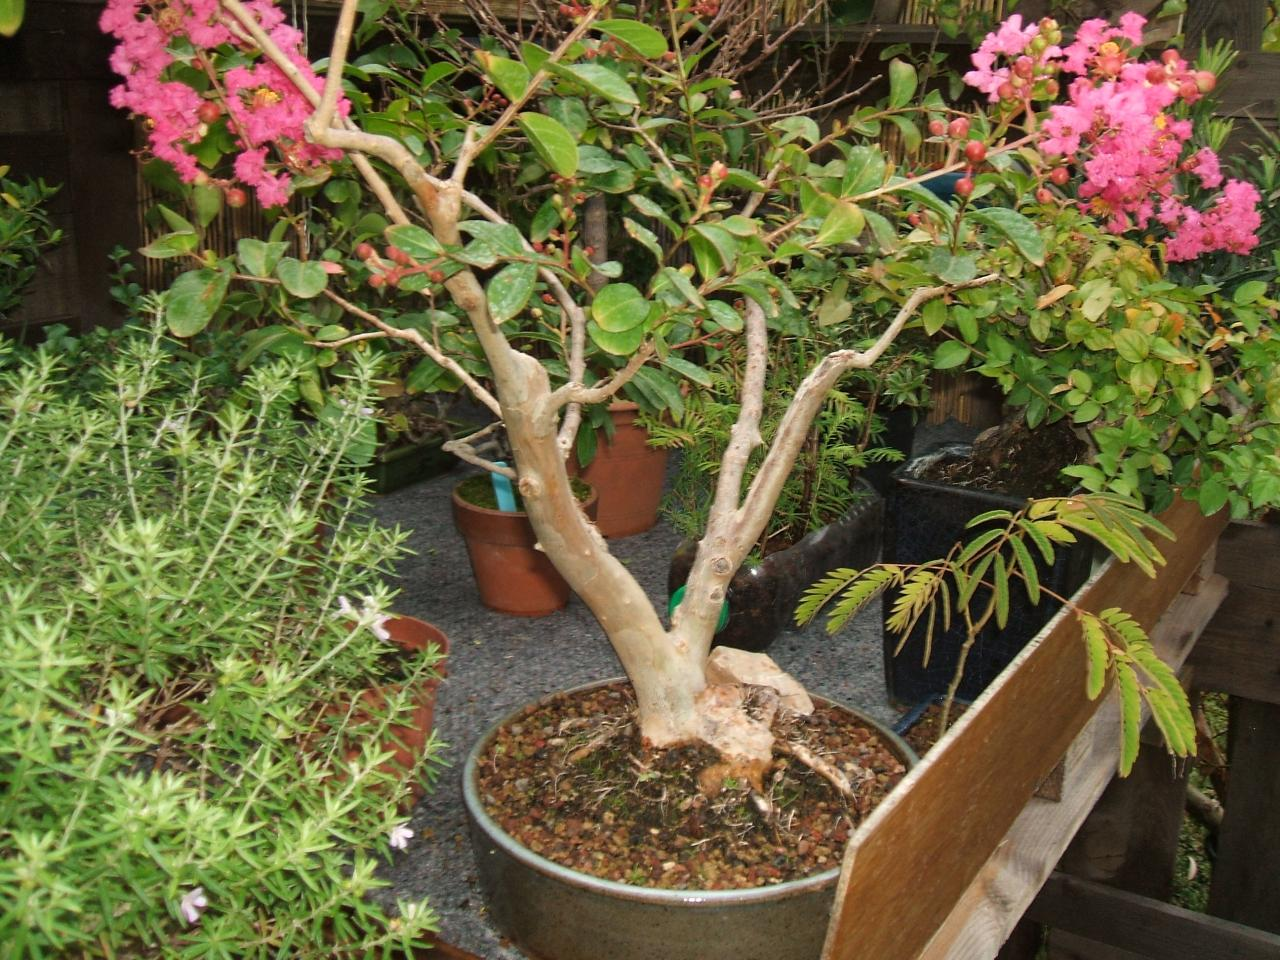 bonsa cr ation fiche d 39 entretien du lilas syringa vulgarisa. Black Bedroom Furniture Sets. Home Design Ideas